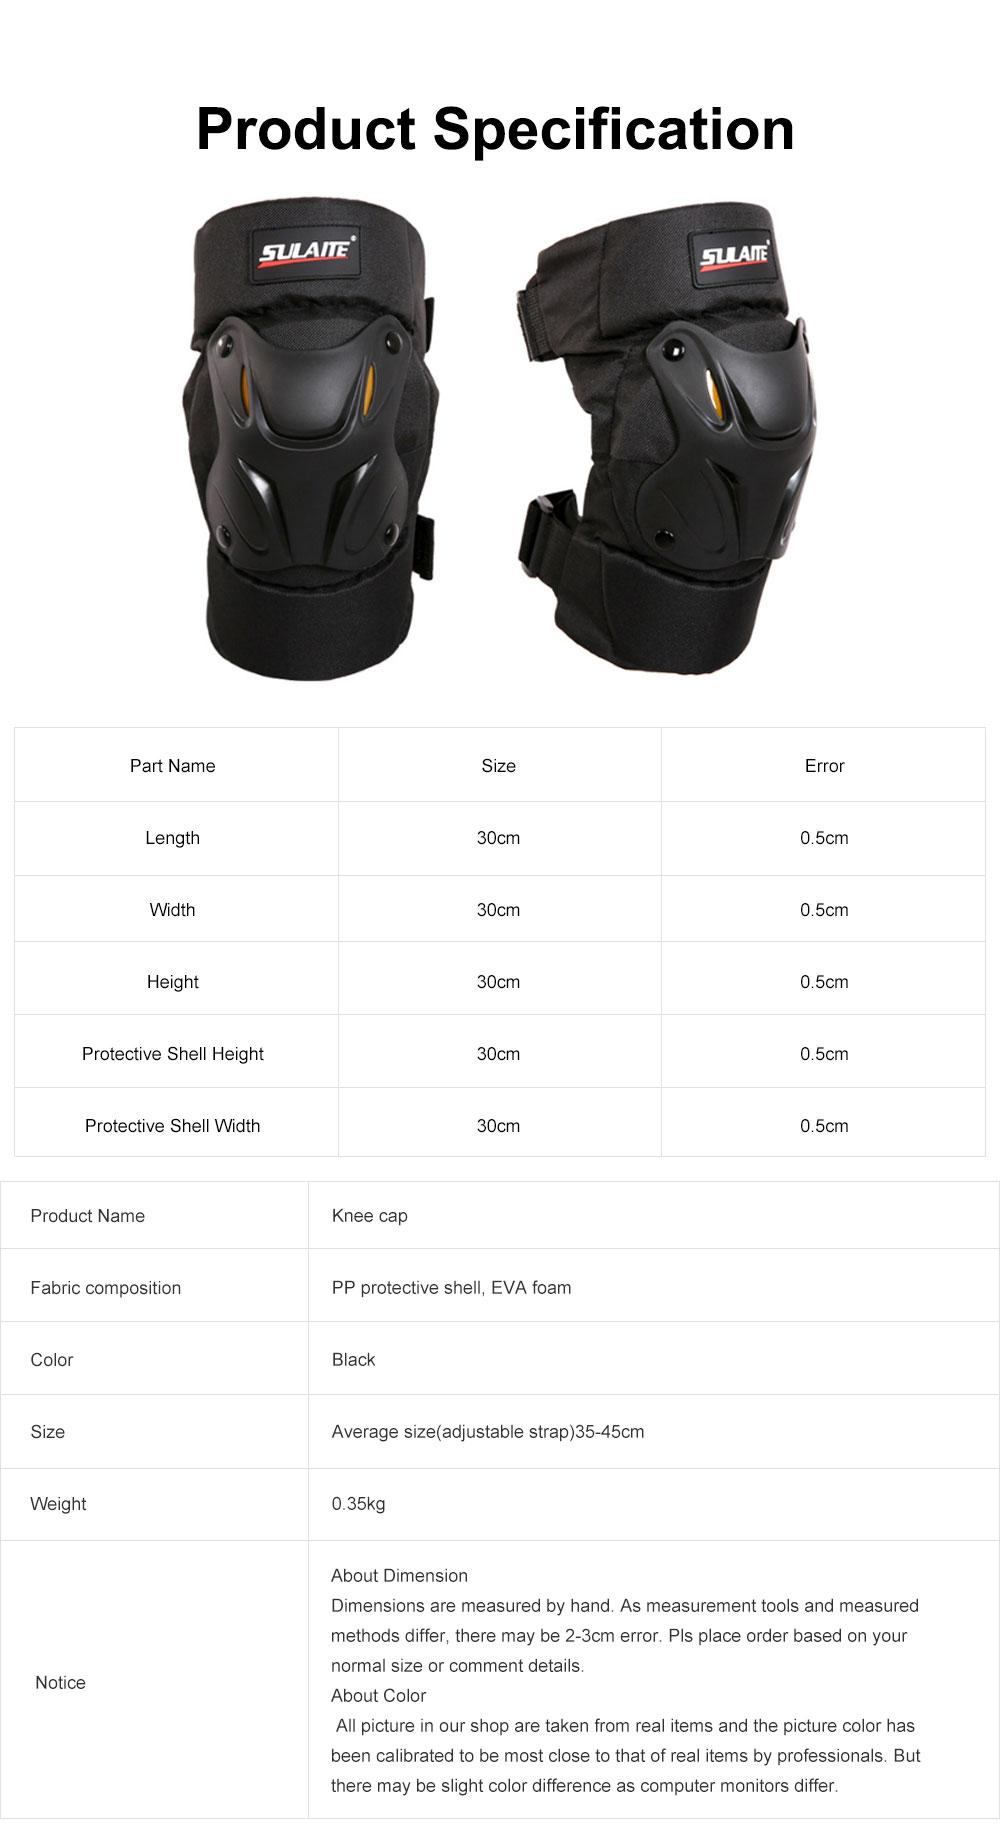 Motorbike Anti-stumbling Kneecap Outdoor Roller Skating Protective Clothing for Knees Heat Resistant Knee Cap Impact Resistant Knee Pads Knee-cap 6